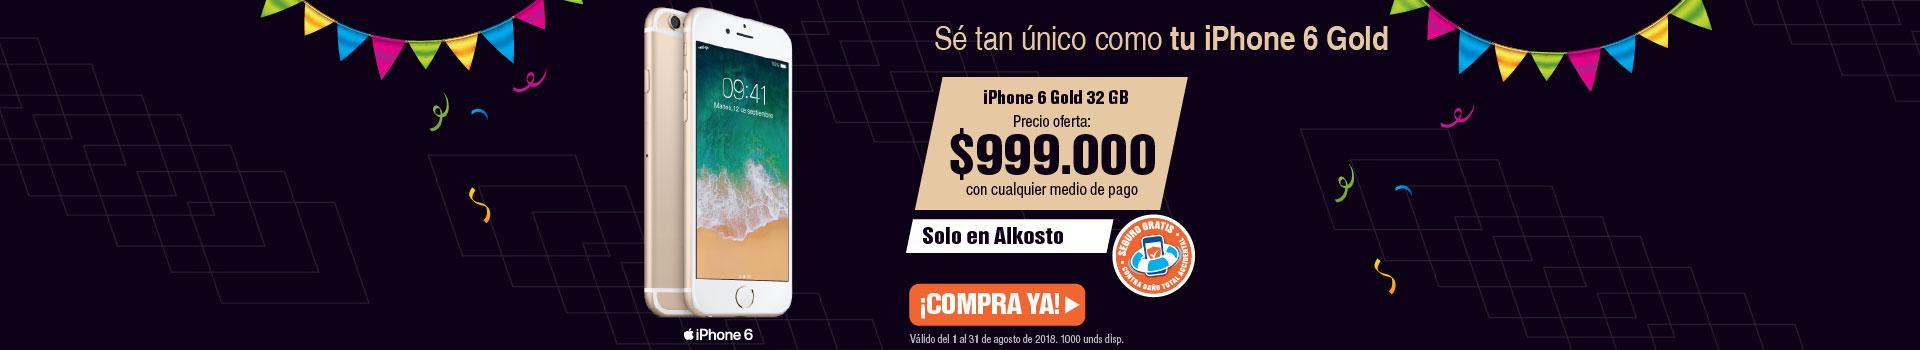 AK-HIPER-10-celulares-PP---Apple-iPhone6Dr-Ago8